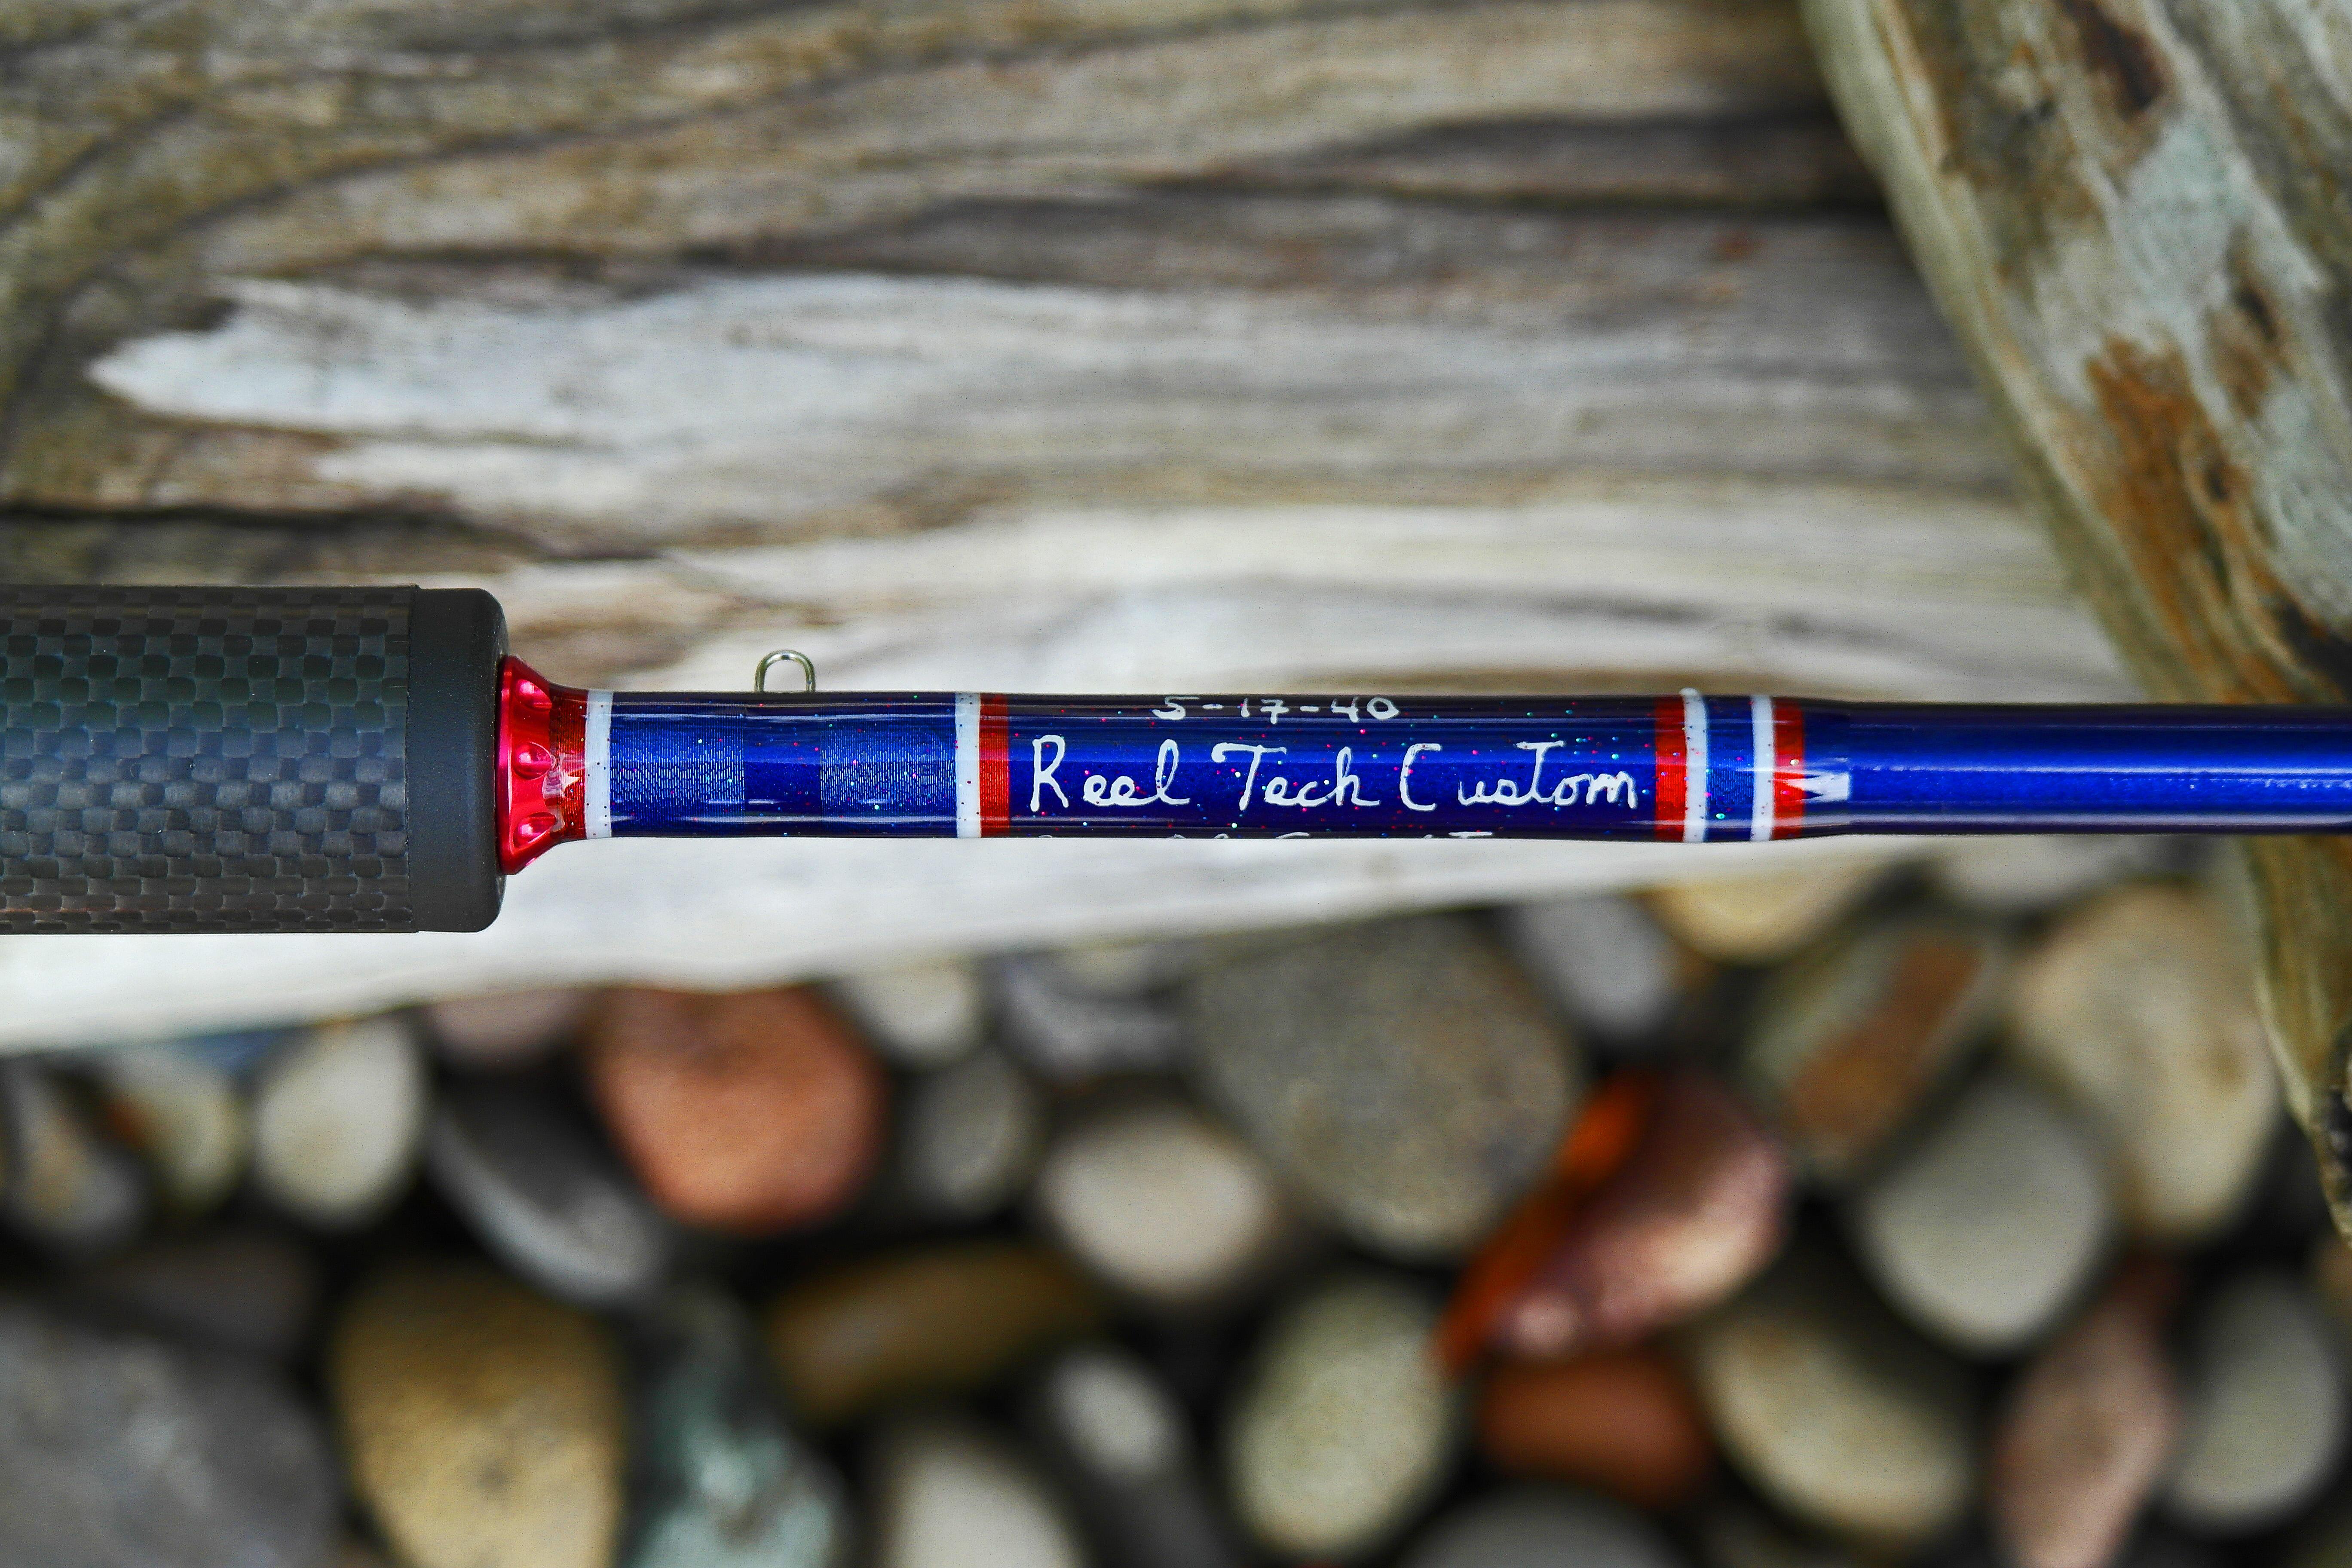 Reel tech custom rods stunning patriotic custom www for Red fishing rod